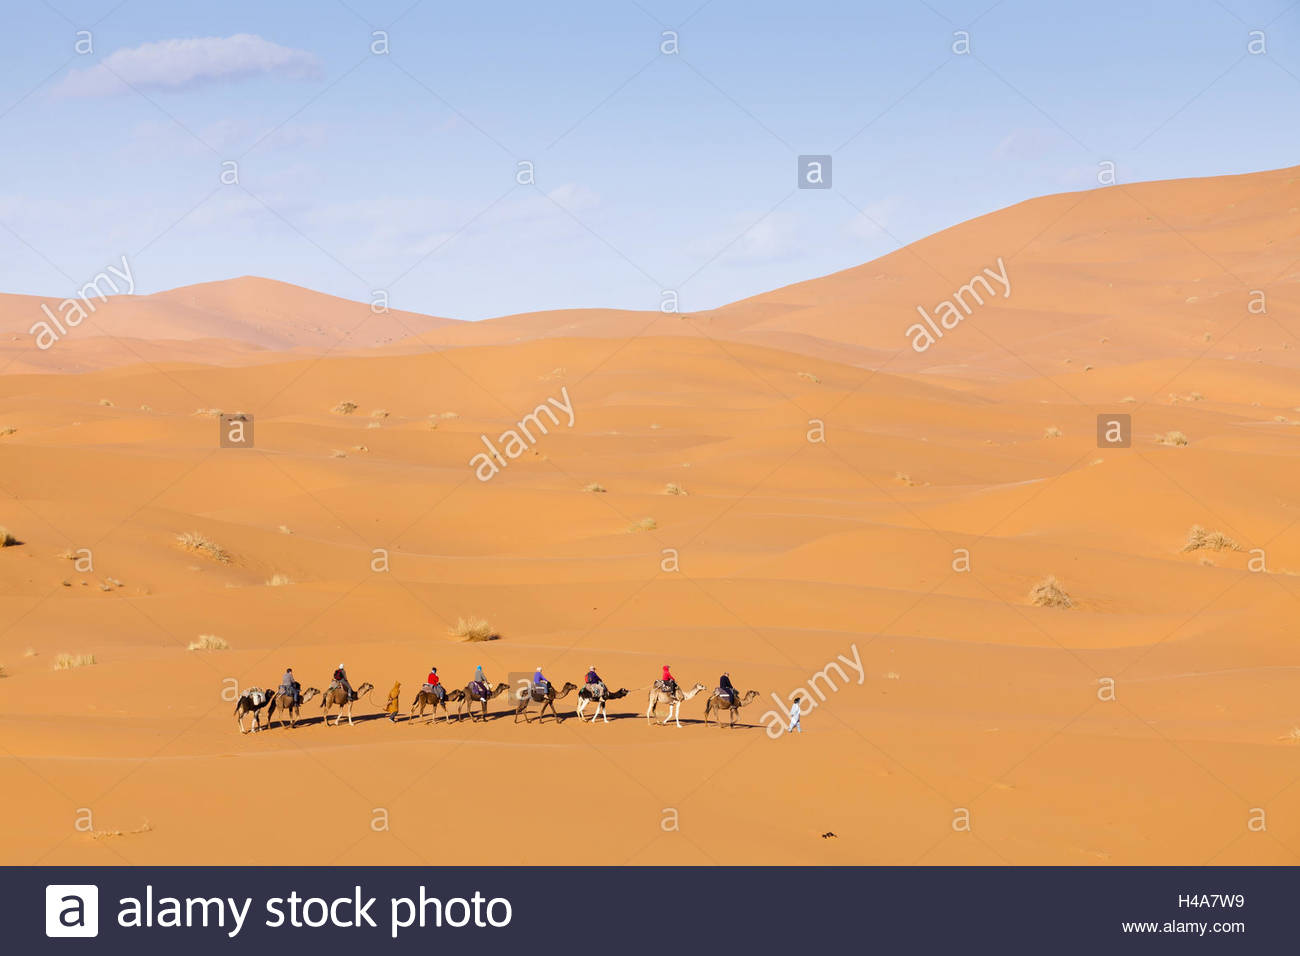 Camel caravan in the dunes of the Erg Chebbi, ocean of Sand, Morocco, North Africa, Merzouga, Stock Photo